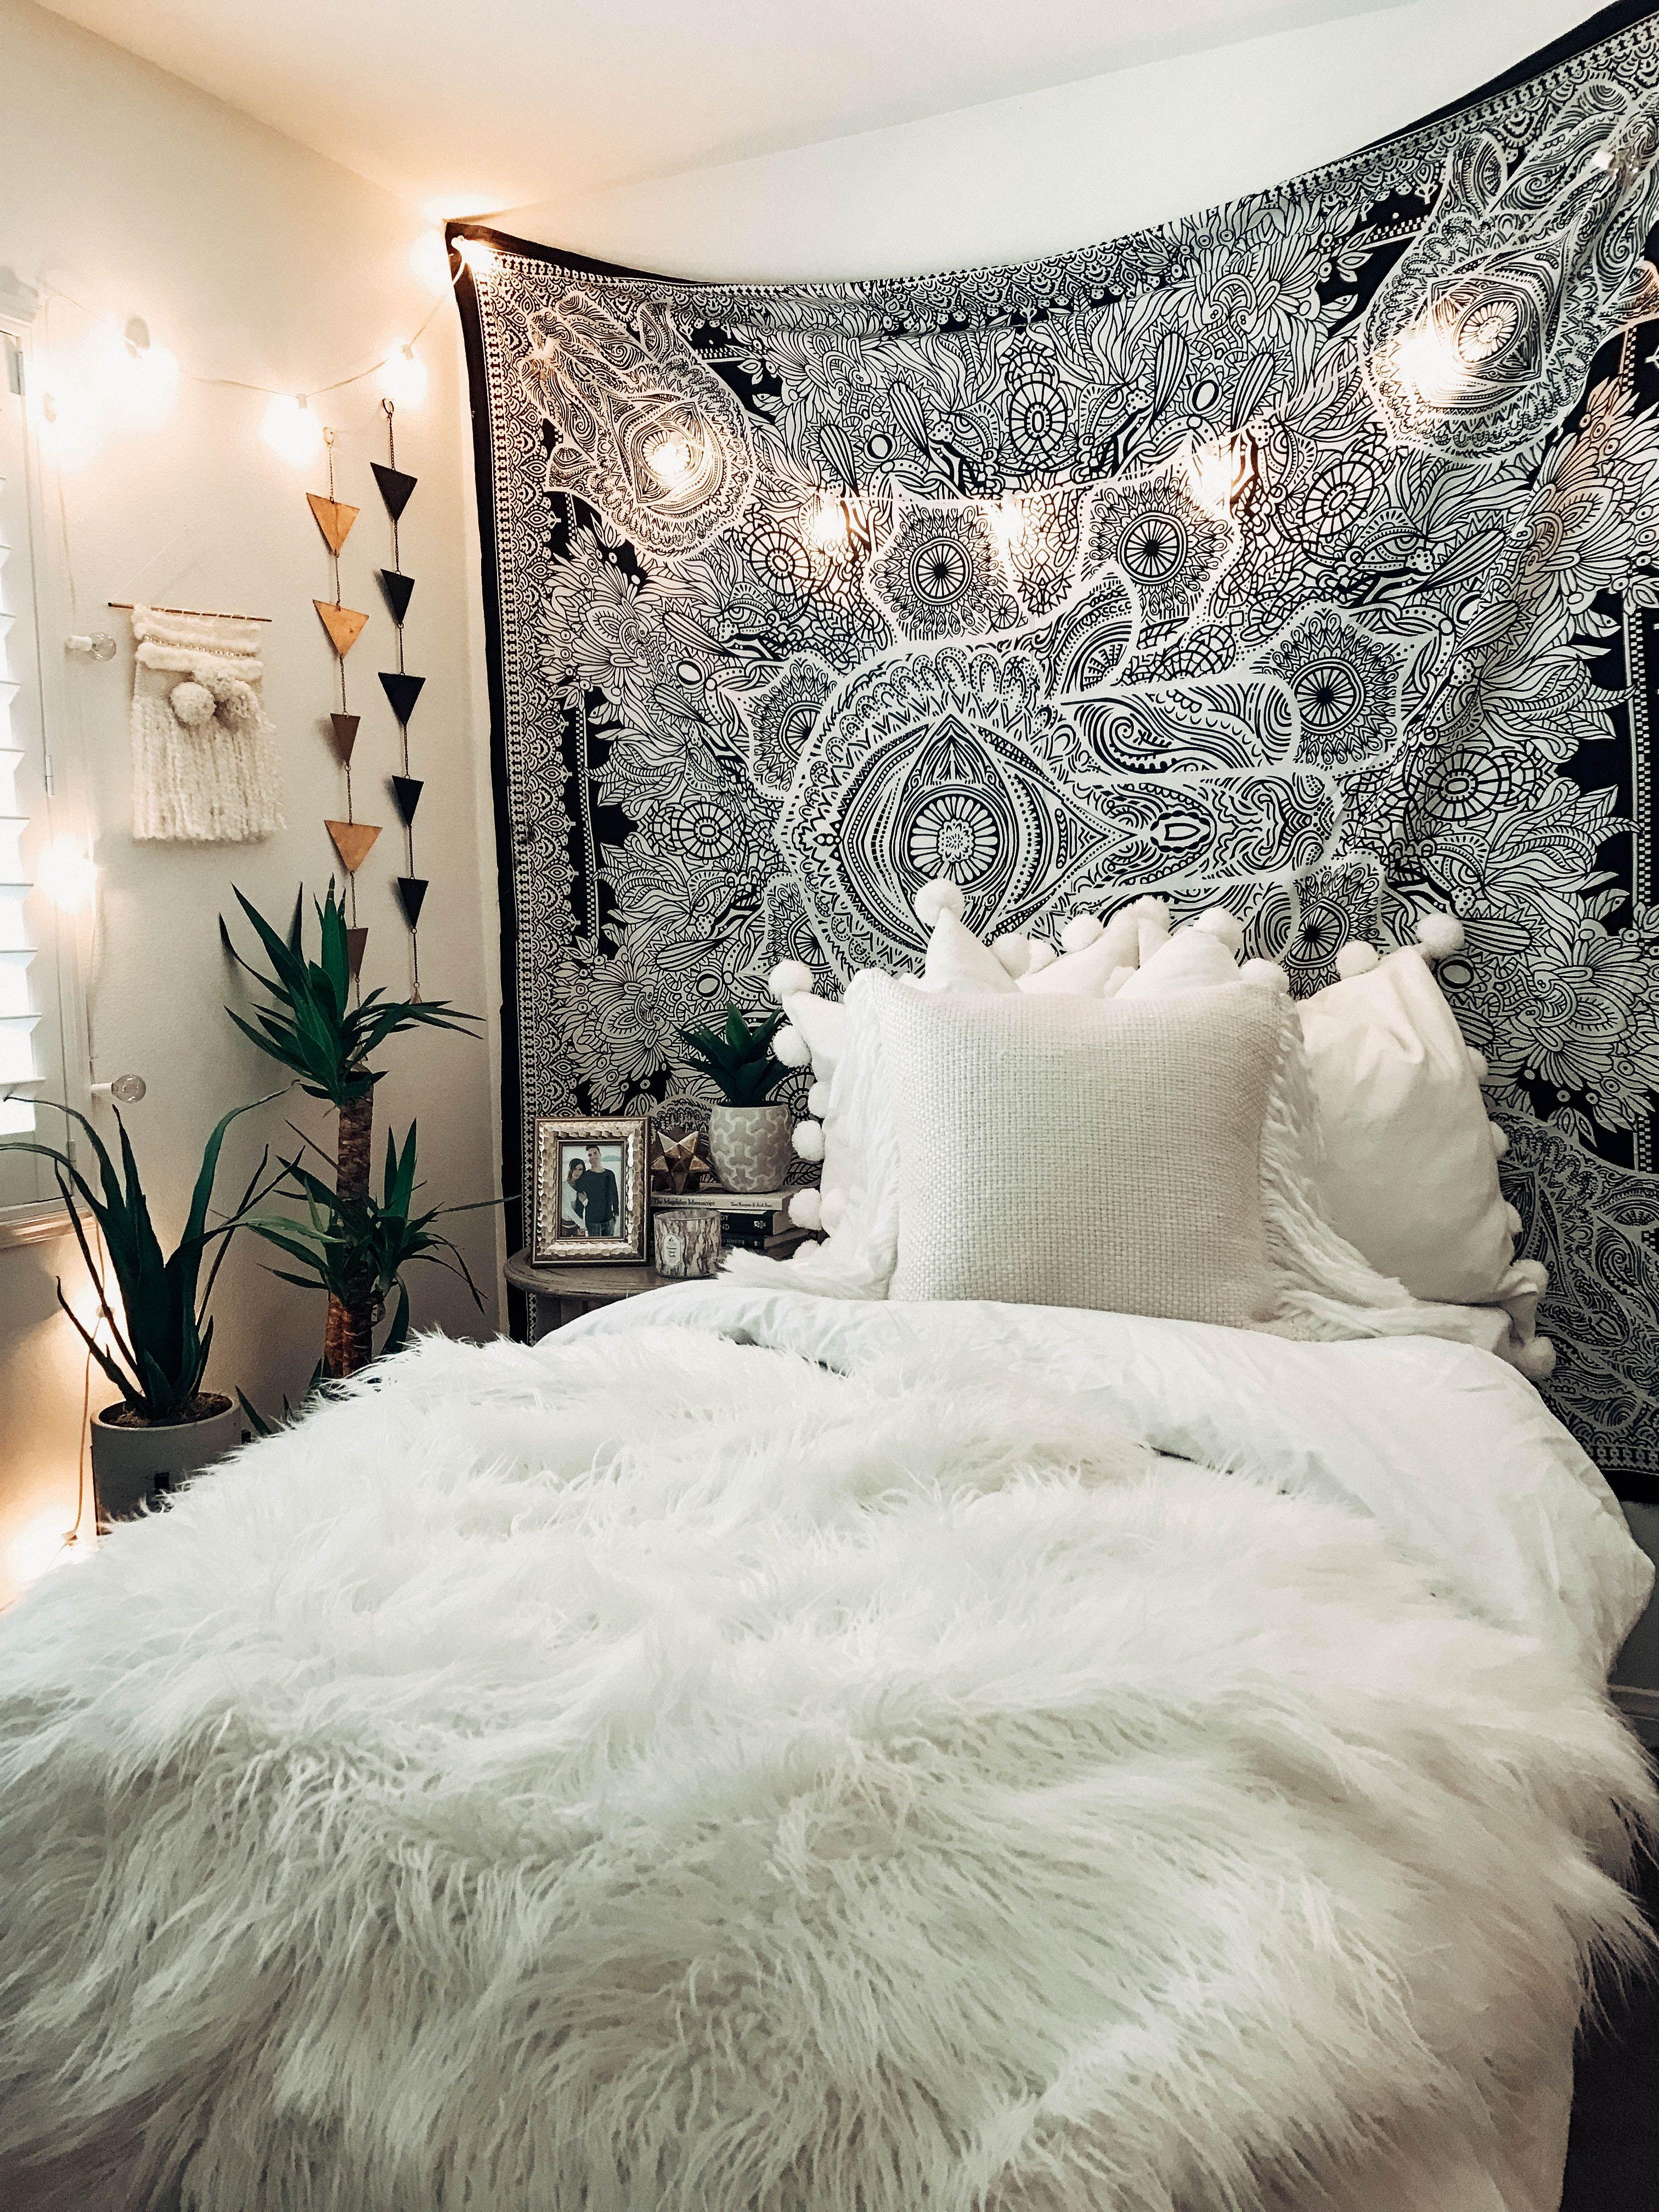 Bohemian Boho Inspirierten Betten Schlafzimmer Wand Dekor Bohmischen